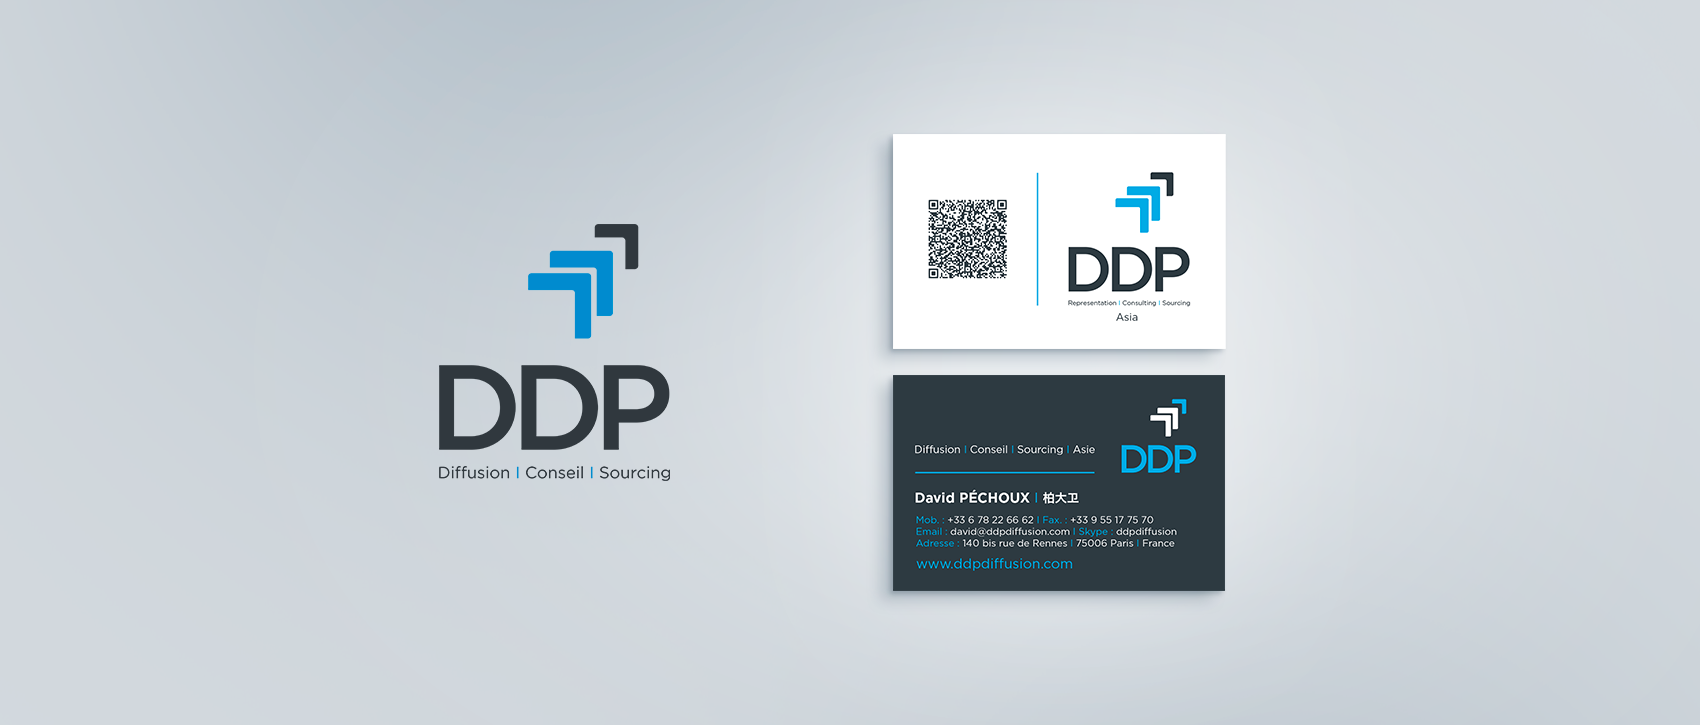 DDP DIFFUSION IDENTITÉ